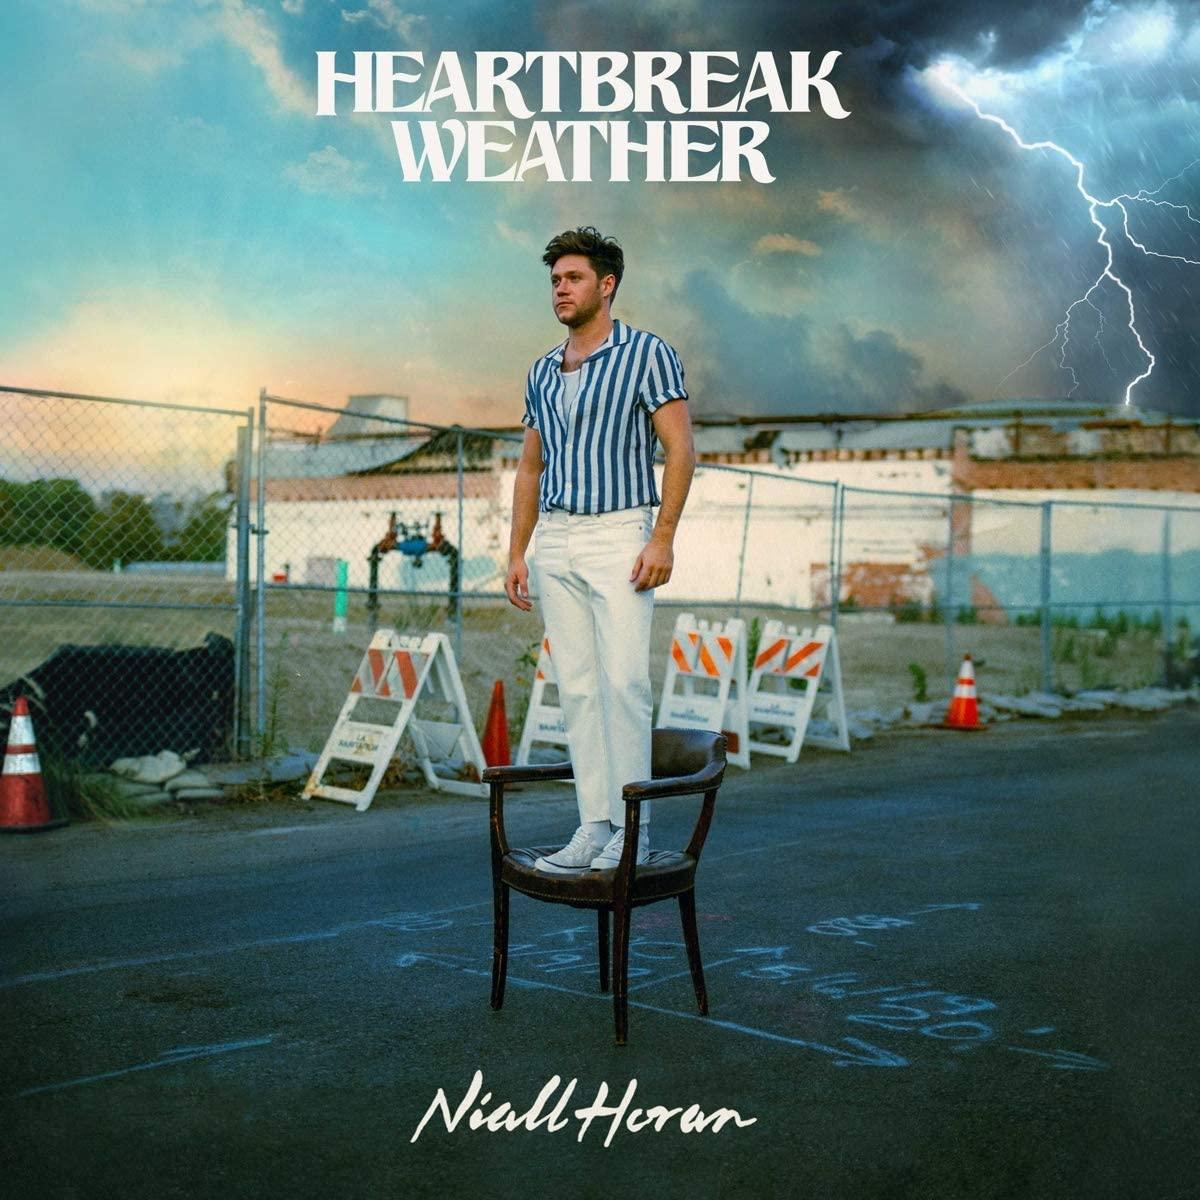 Copertina Vinile 33 giri Heartbreak Weather di Niall Horan